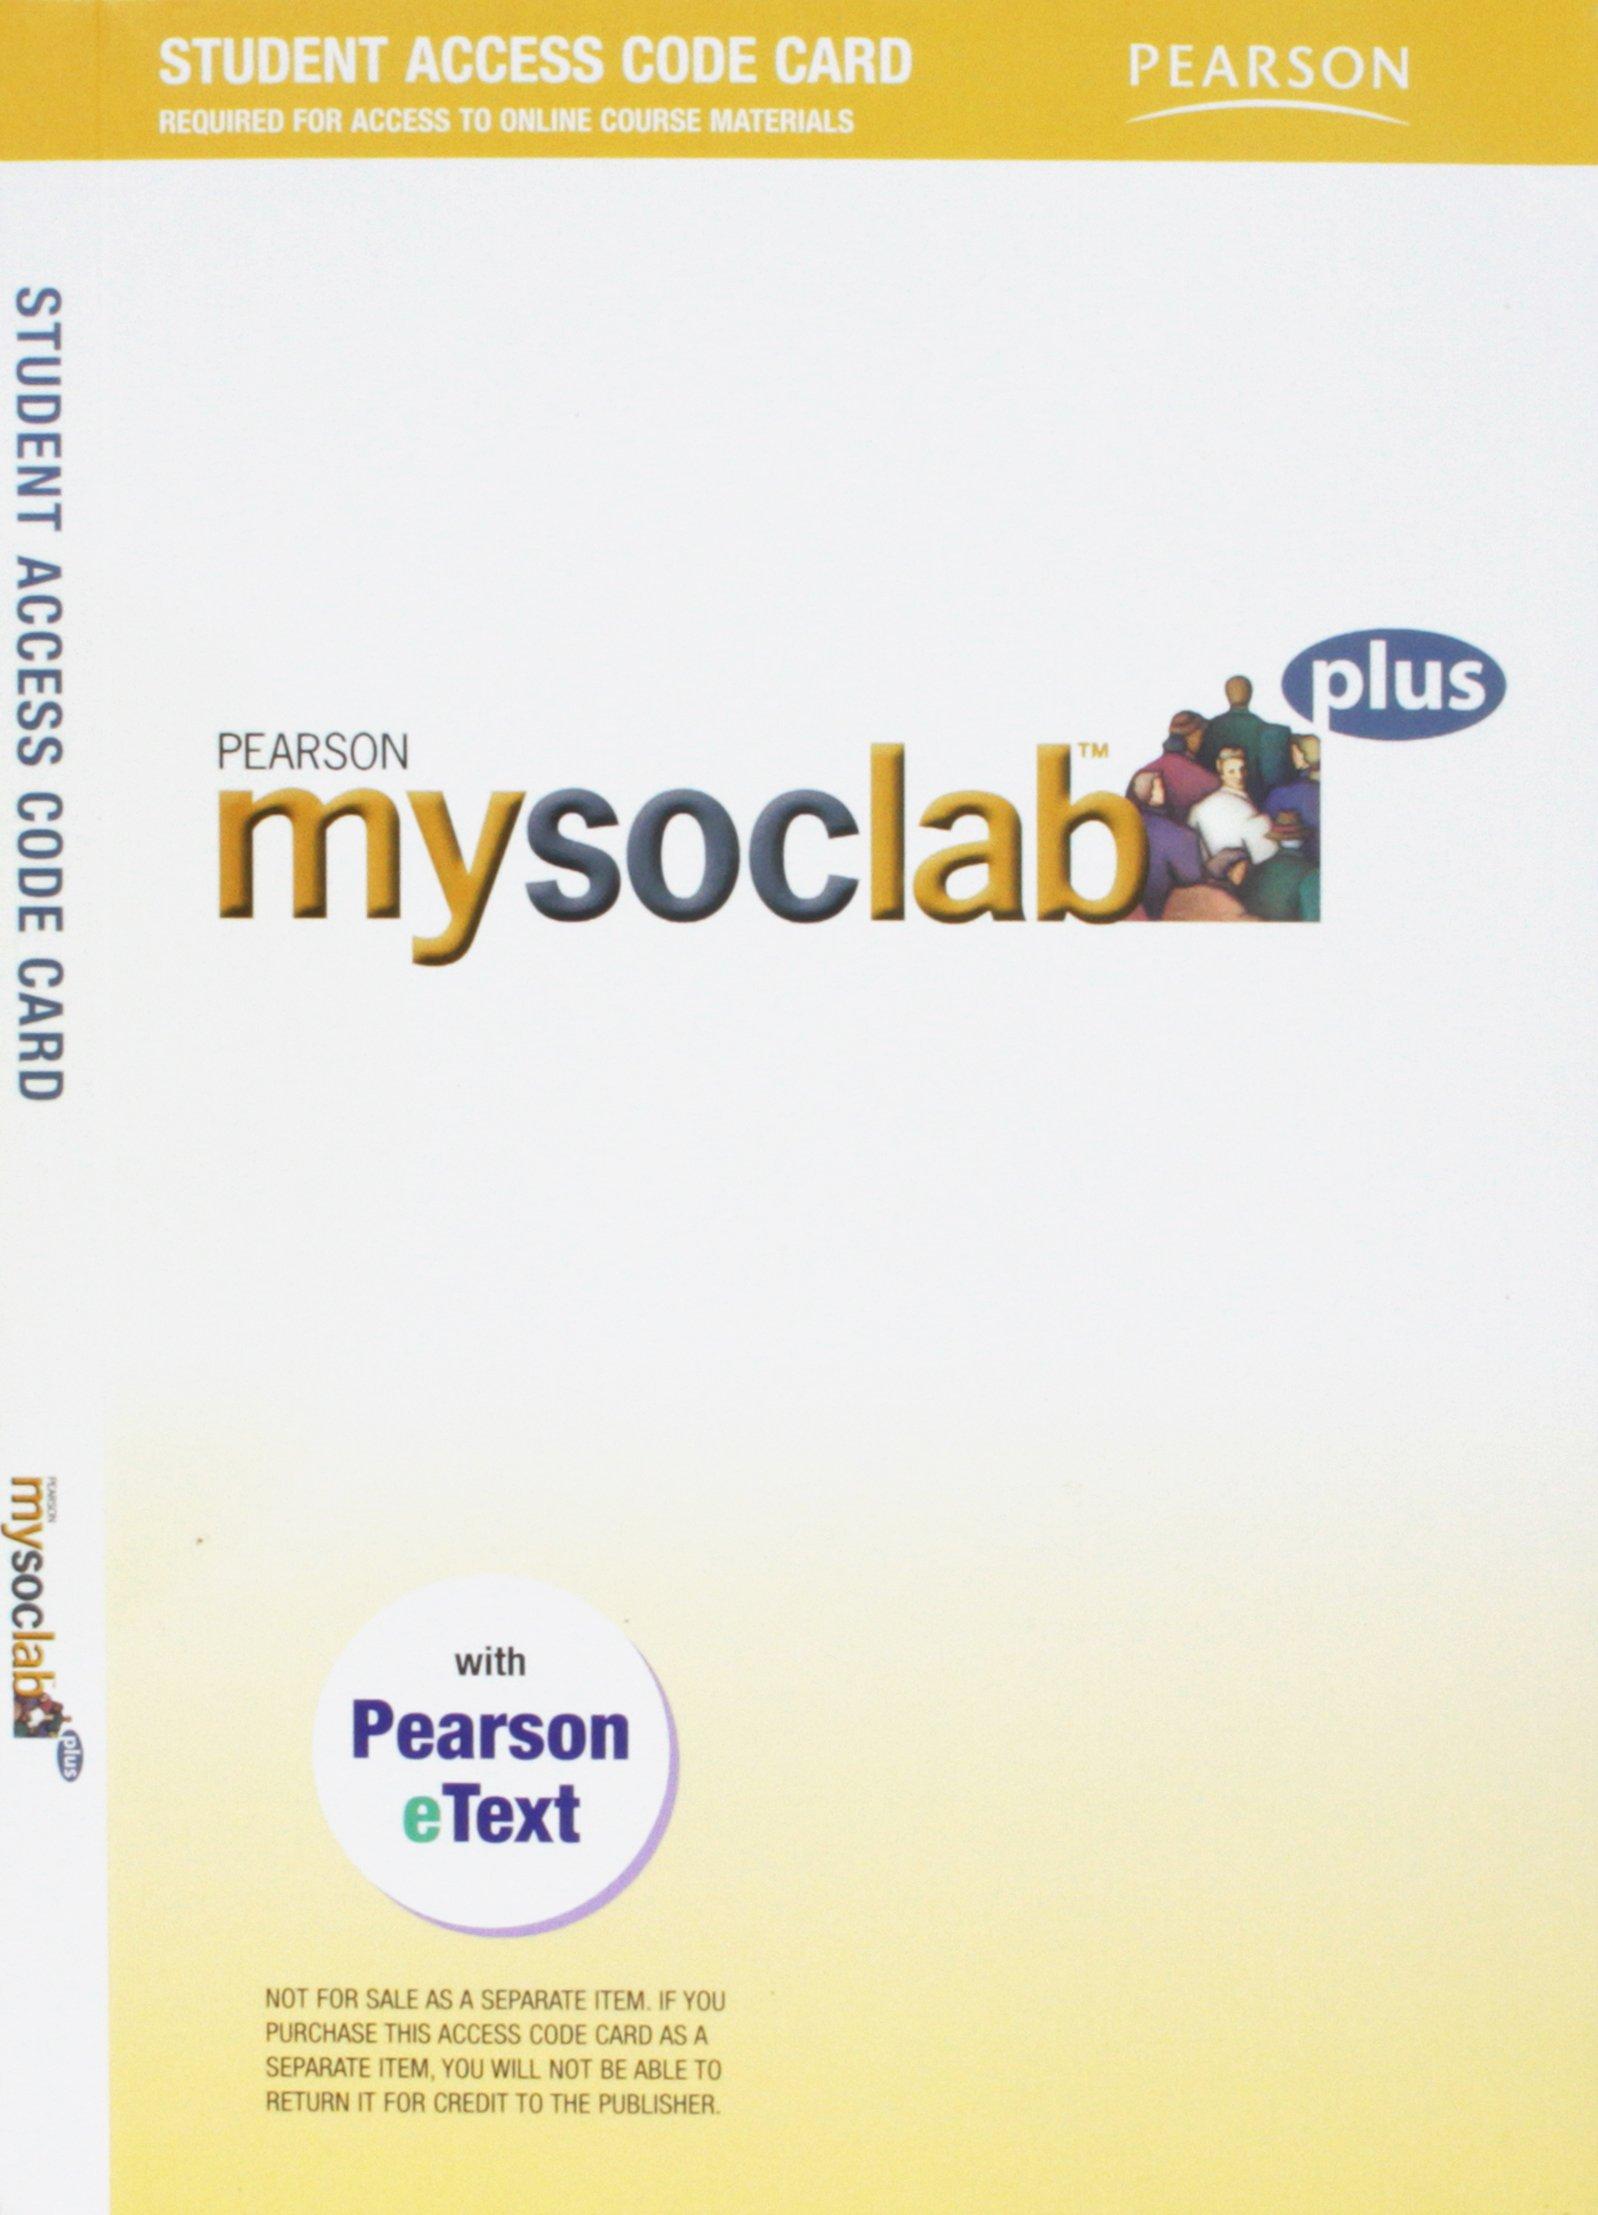 Pearson Mysoclab Plus Student Access Code Card PDF